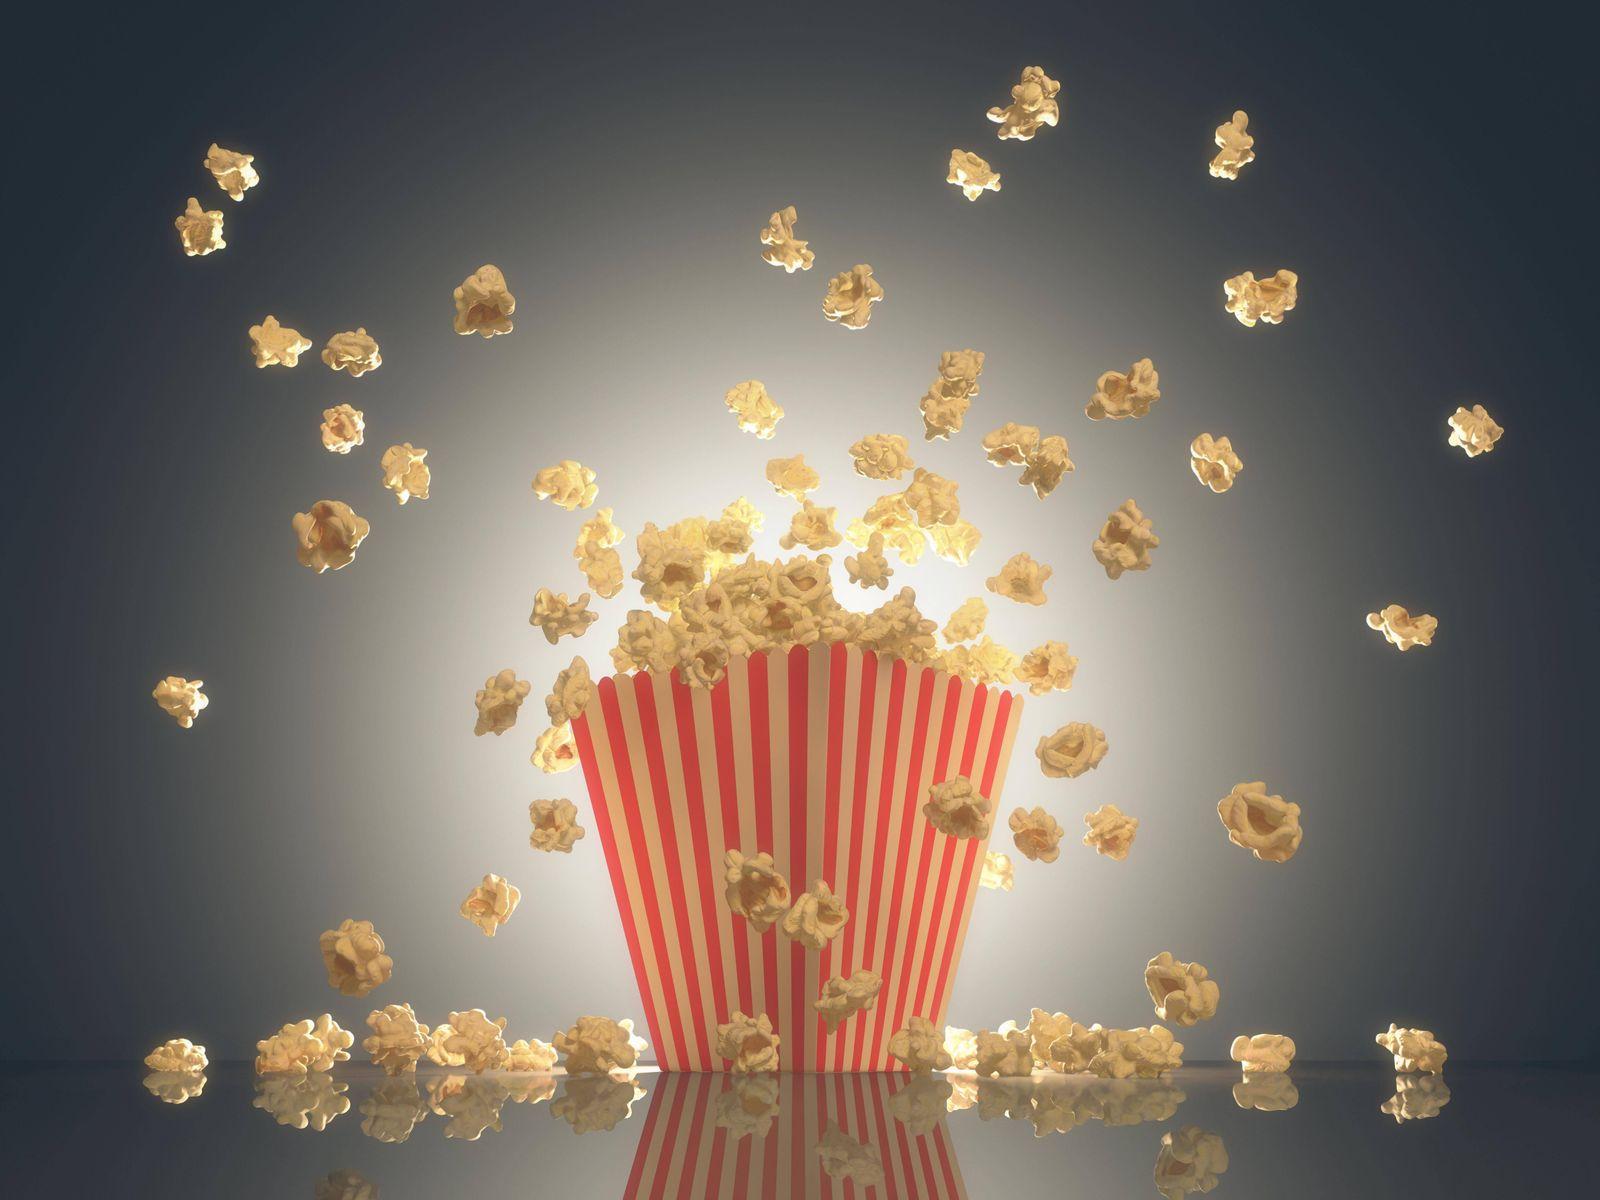 Popcorn Show Time PUBLICATIONxINxGERxSUIxAUTxONLY Copyright xktsdesignx Panthermedia17889768